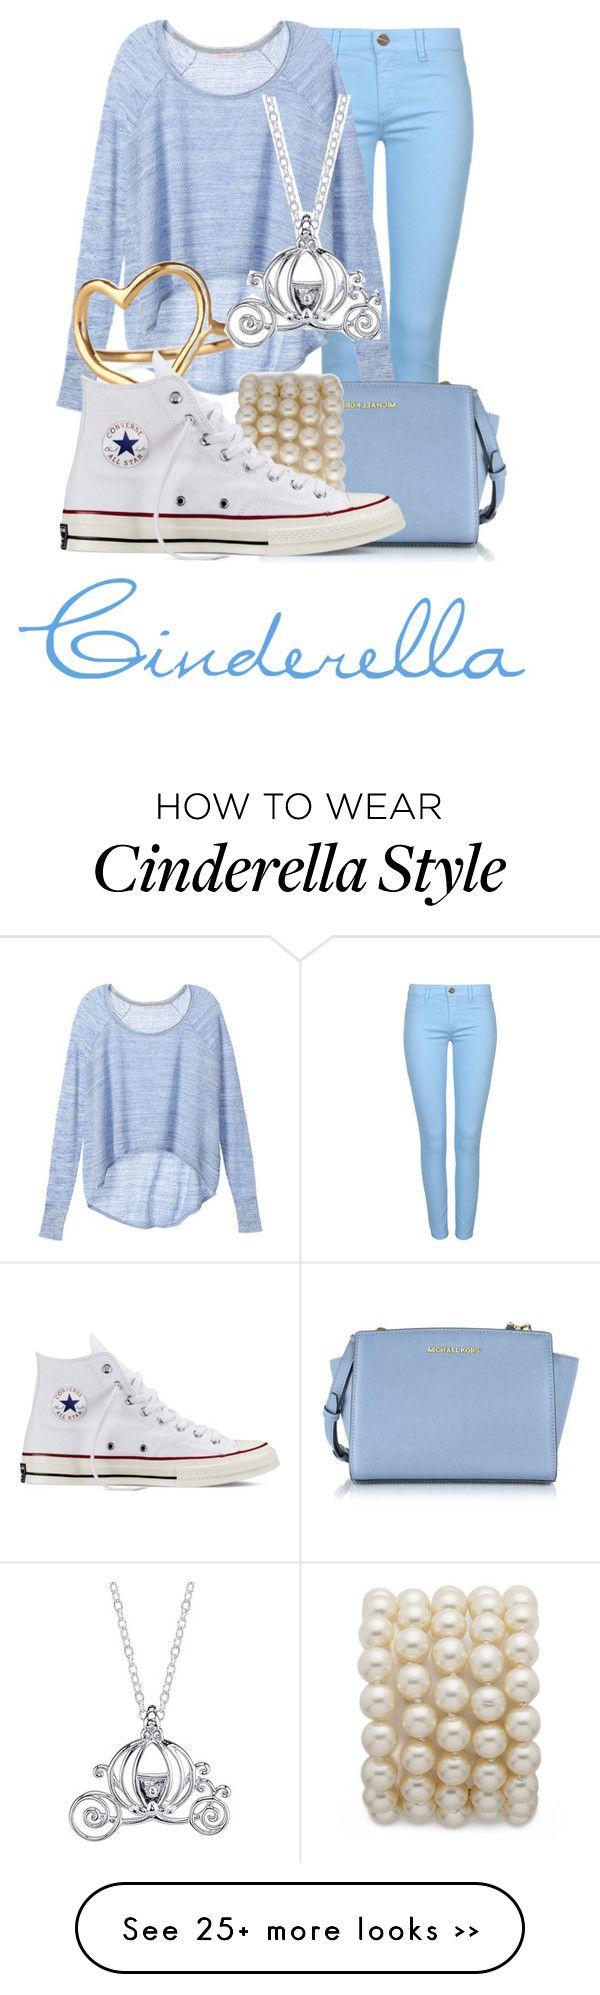 """Cinderella"" by disneyfasion on Polyvore"